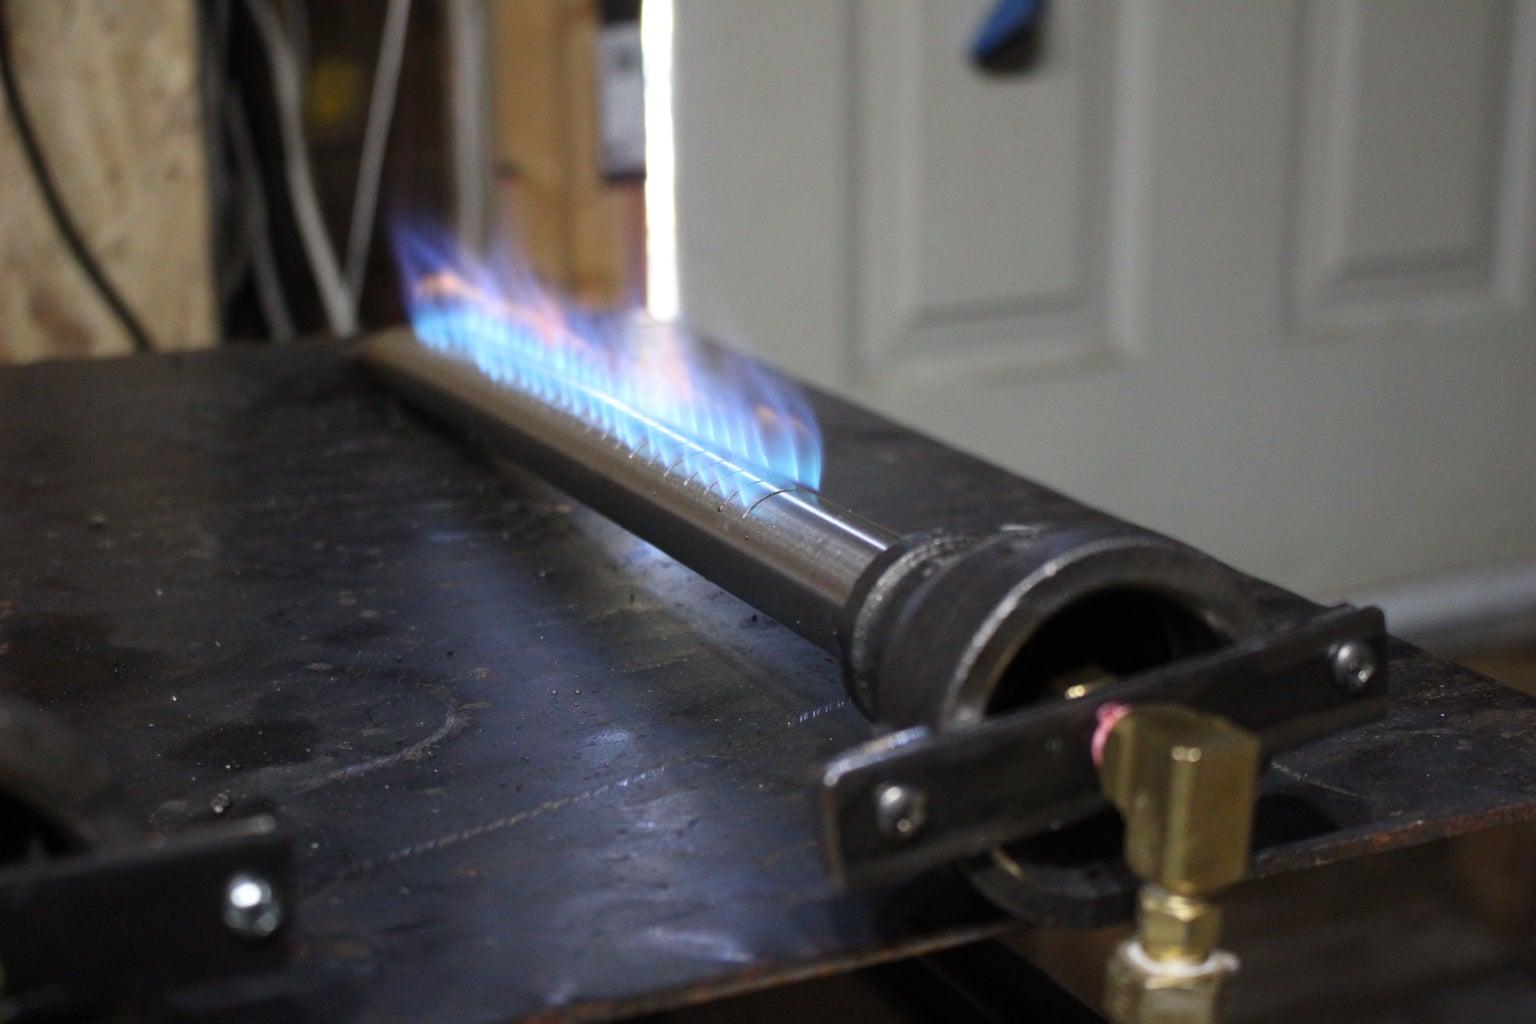 How to Make a BBQ Burner